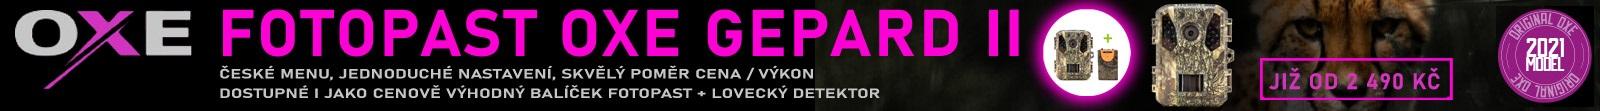 Fotopast OXE Gepard II